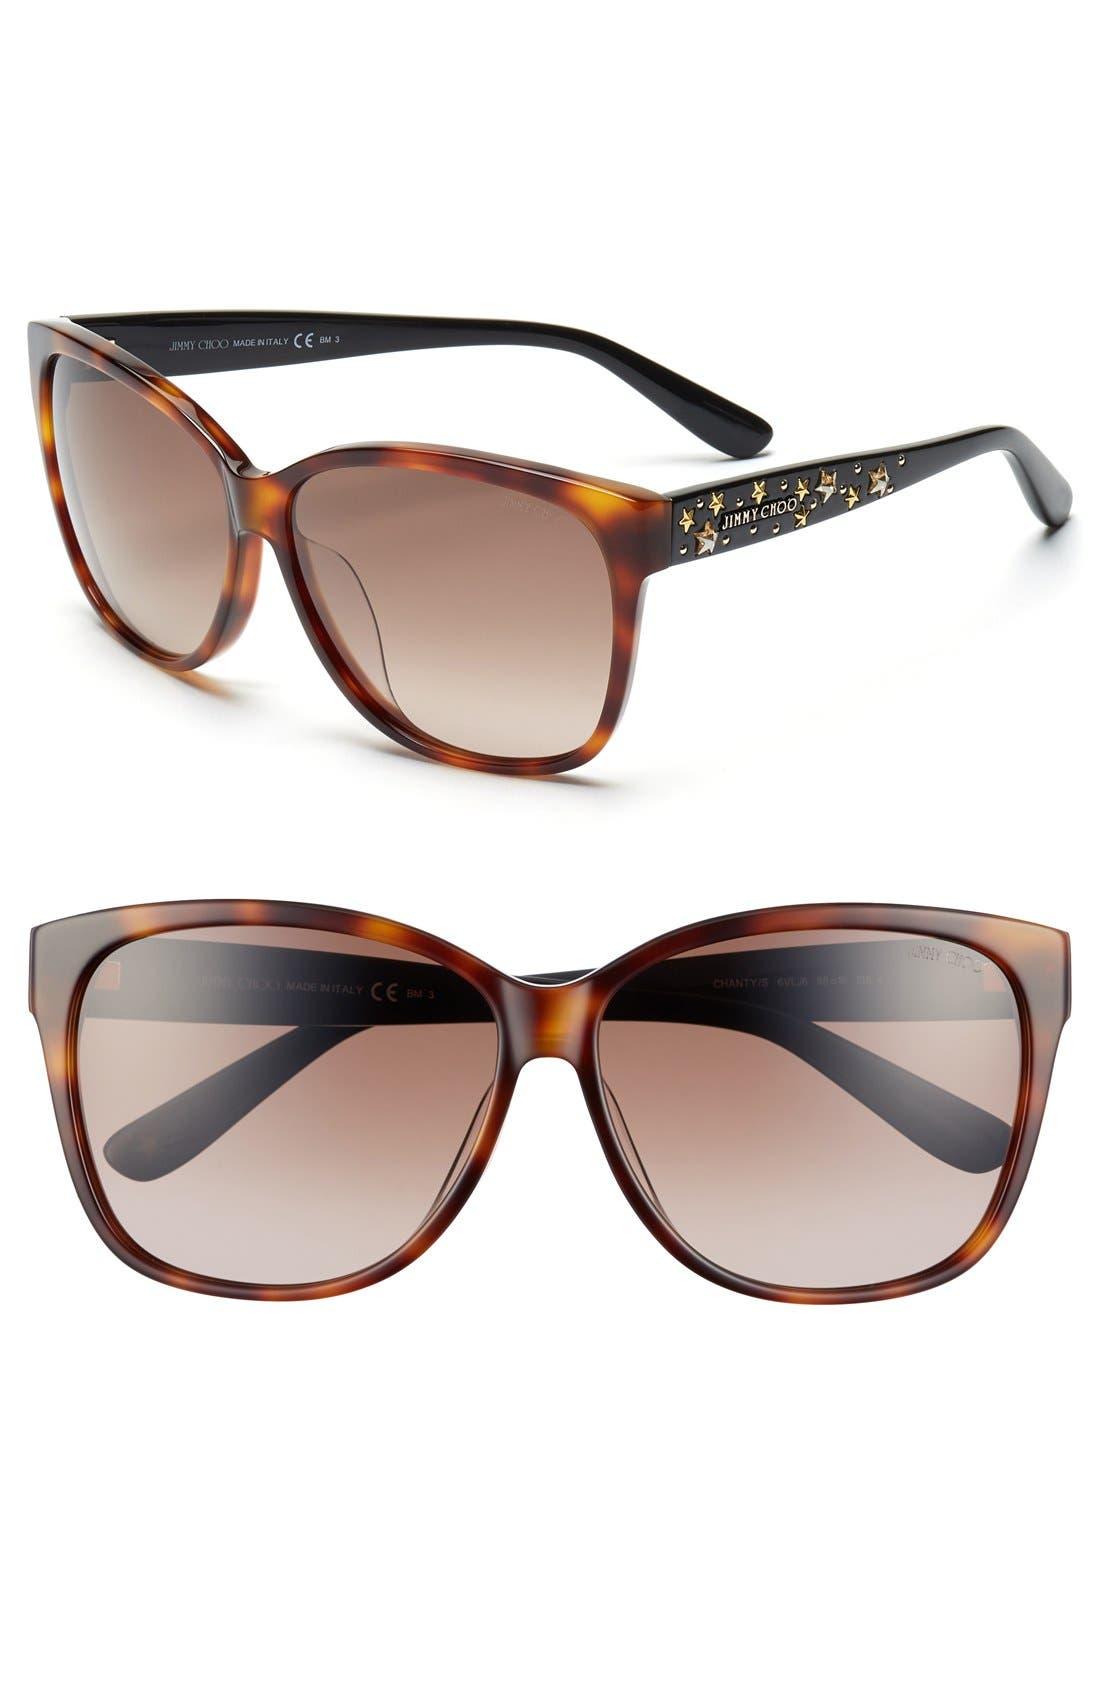 Main Image - Jimmy Choo 'Chantys' 58mm Sunglasses